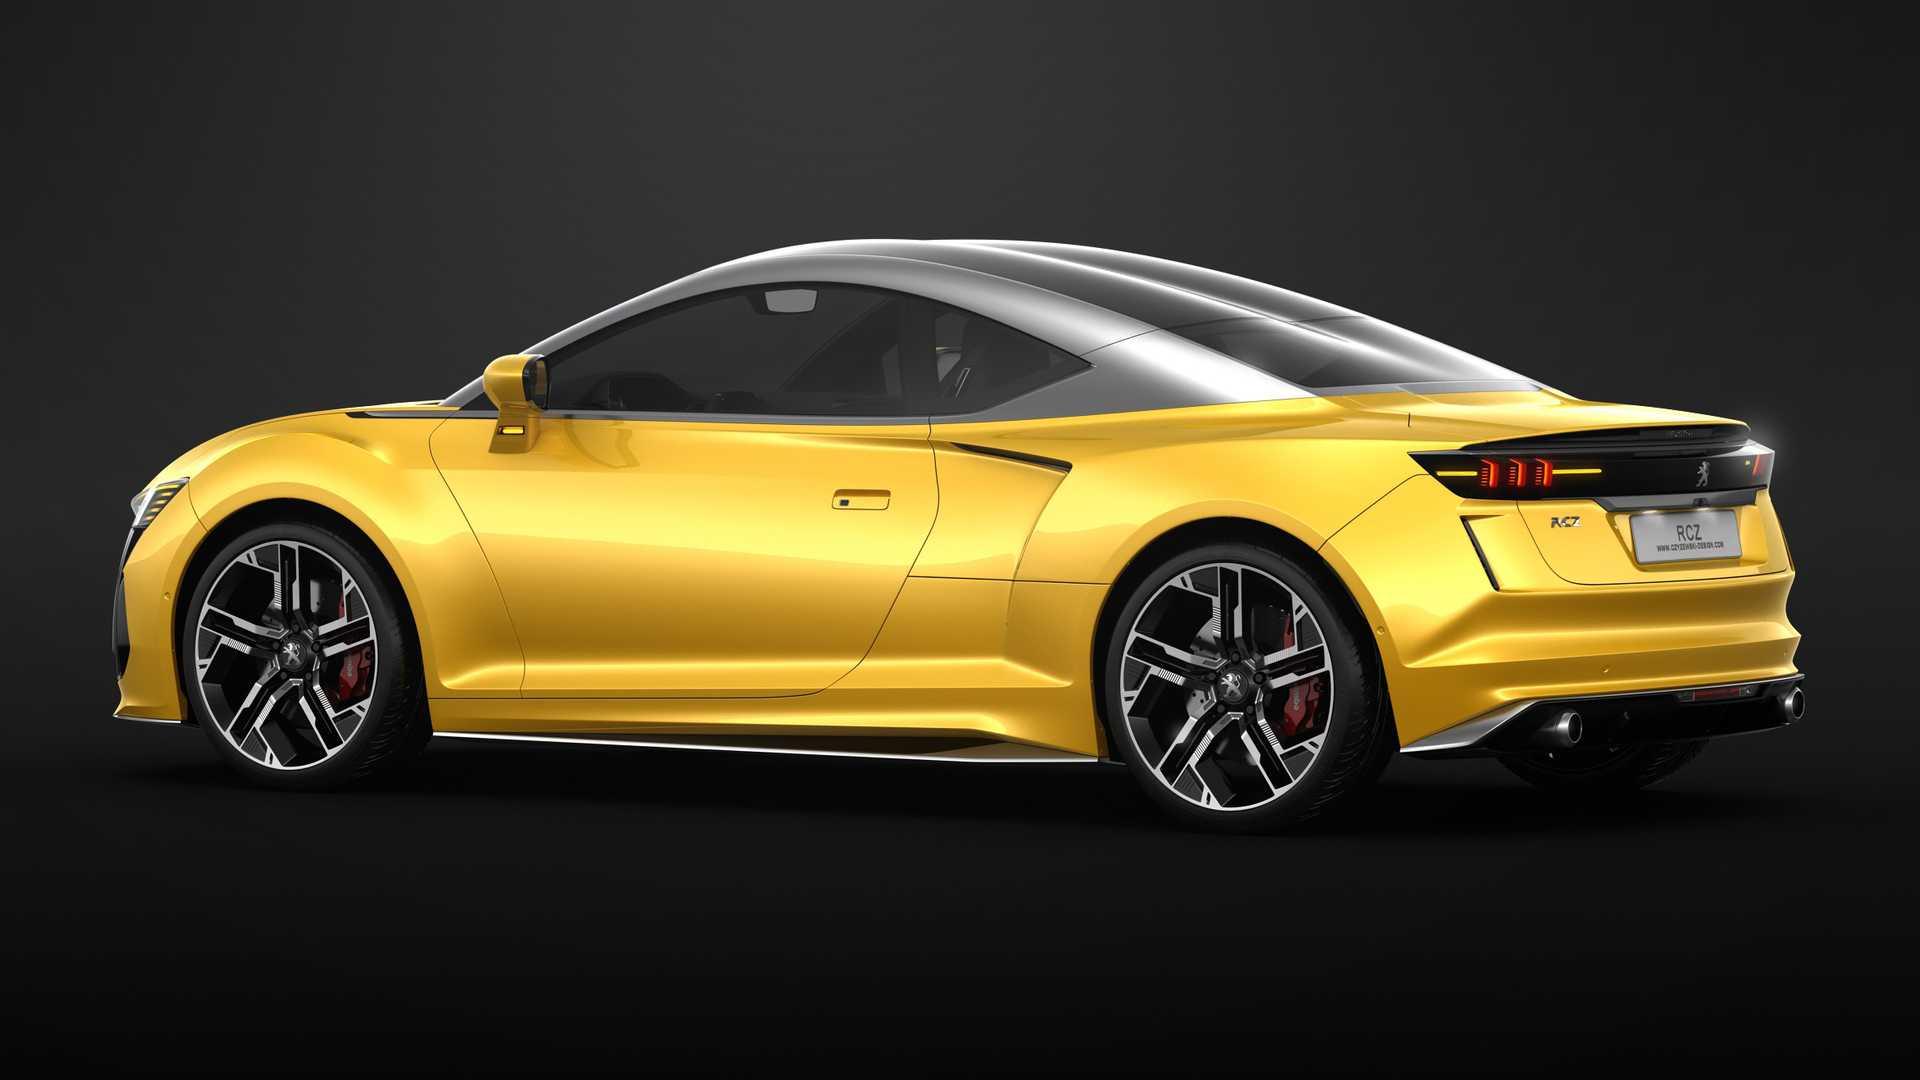 2020_Peugeot_RCZ_rendering_0019